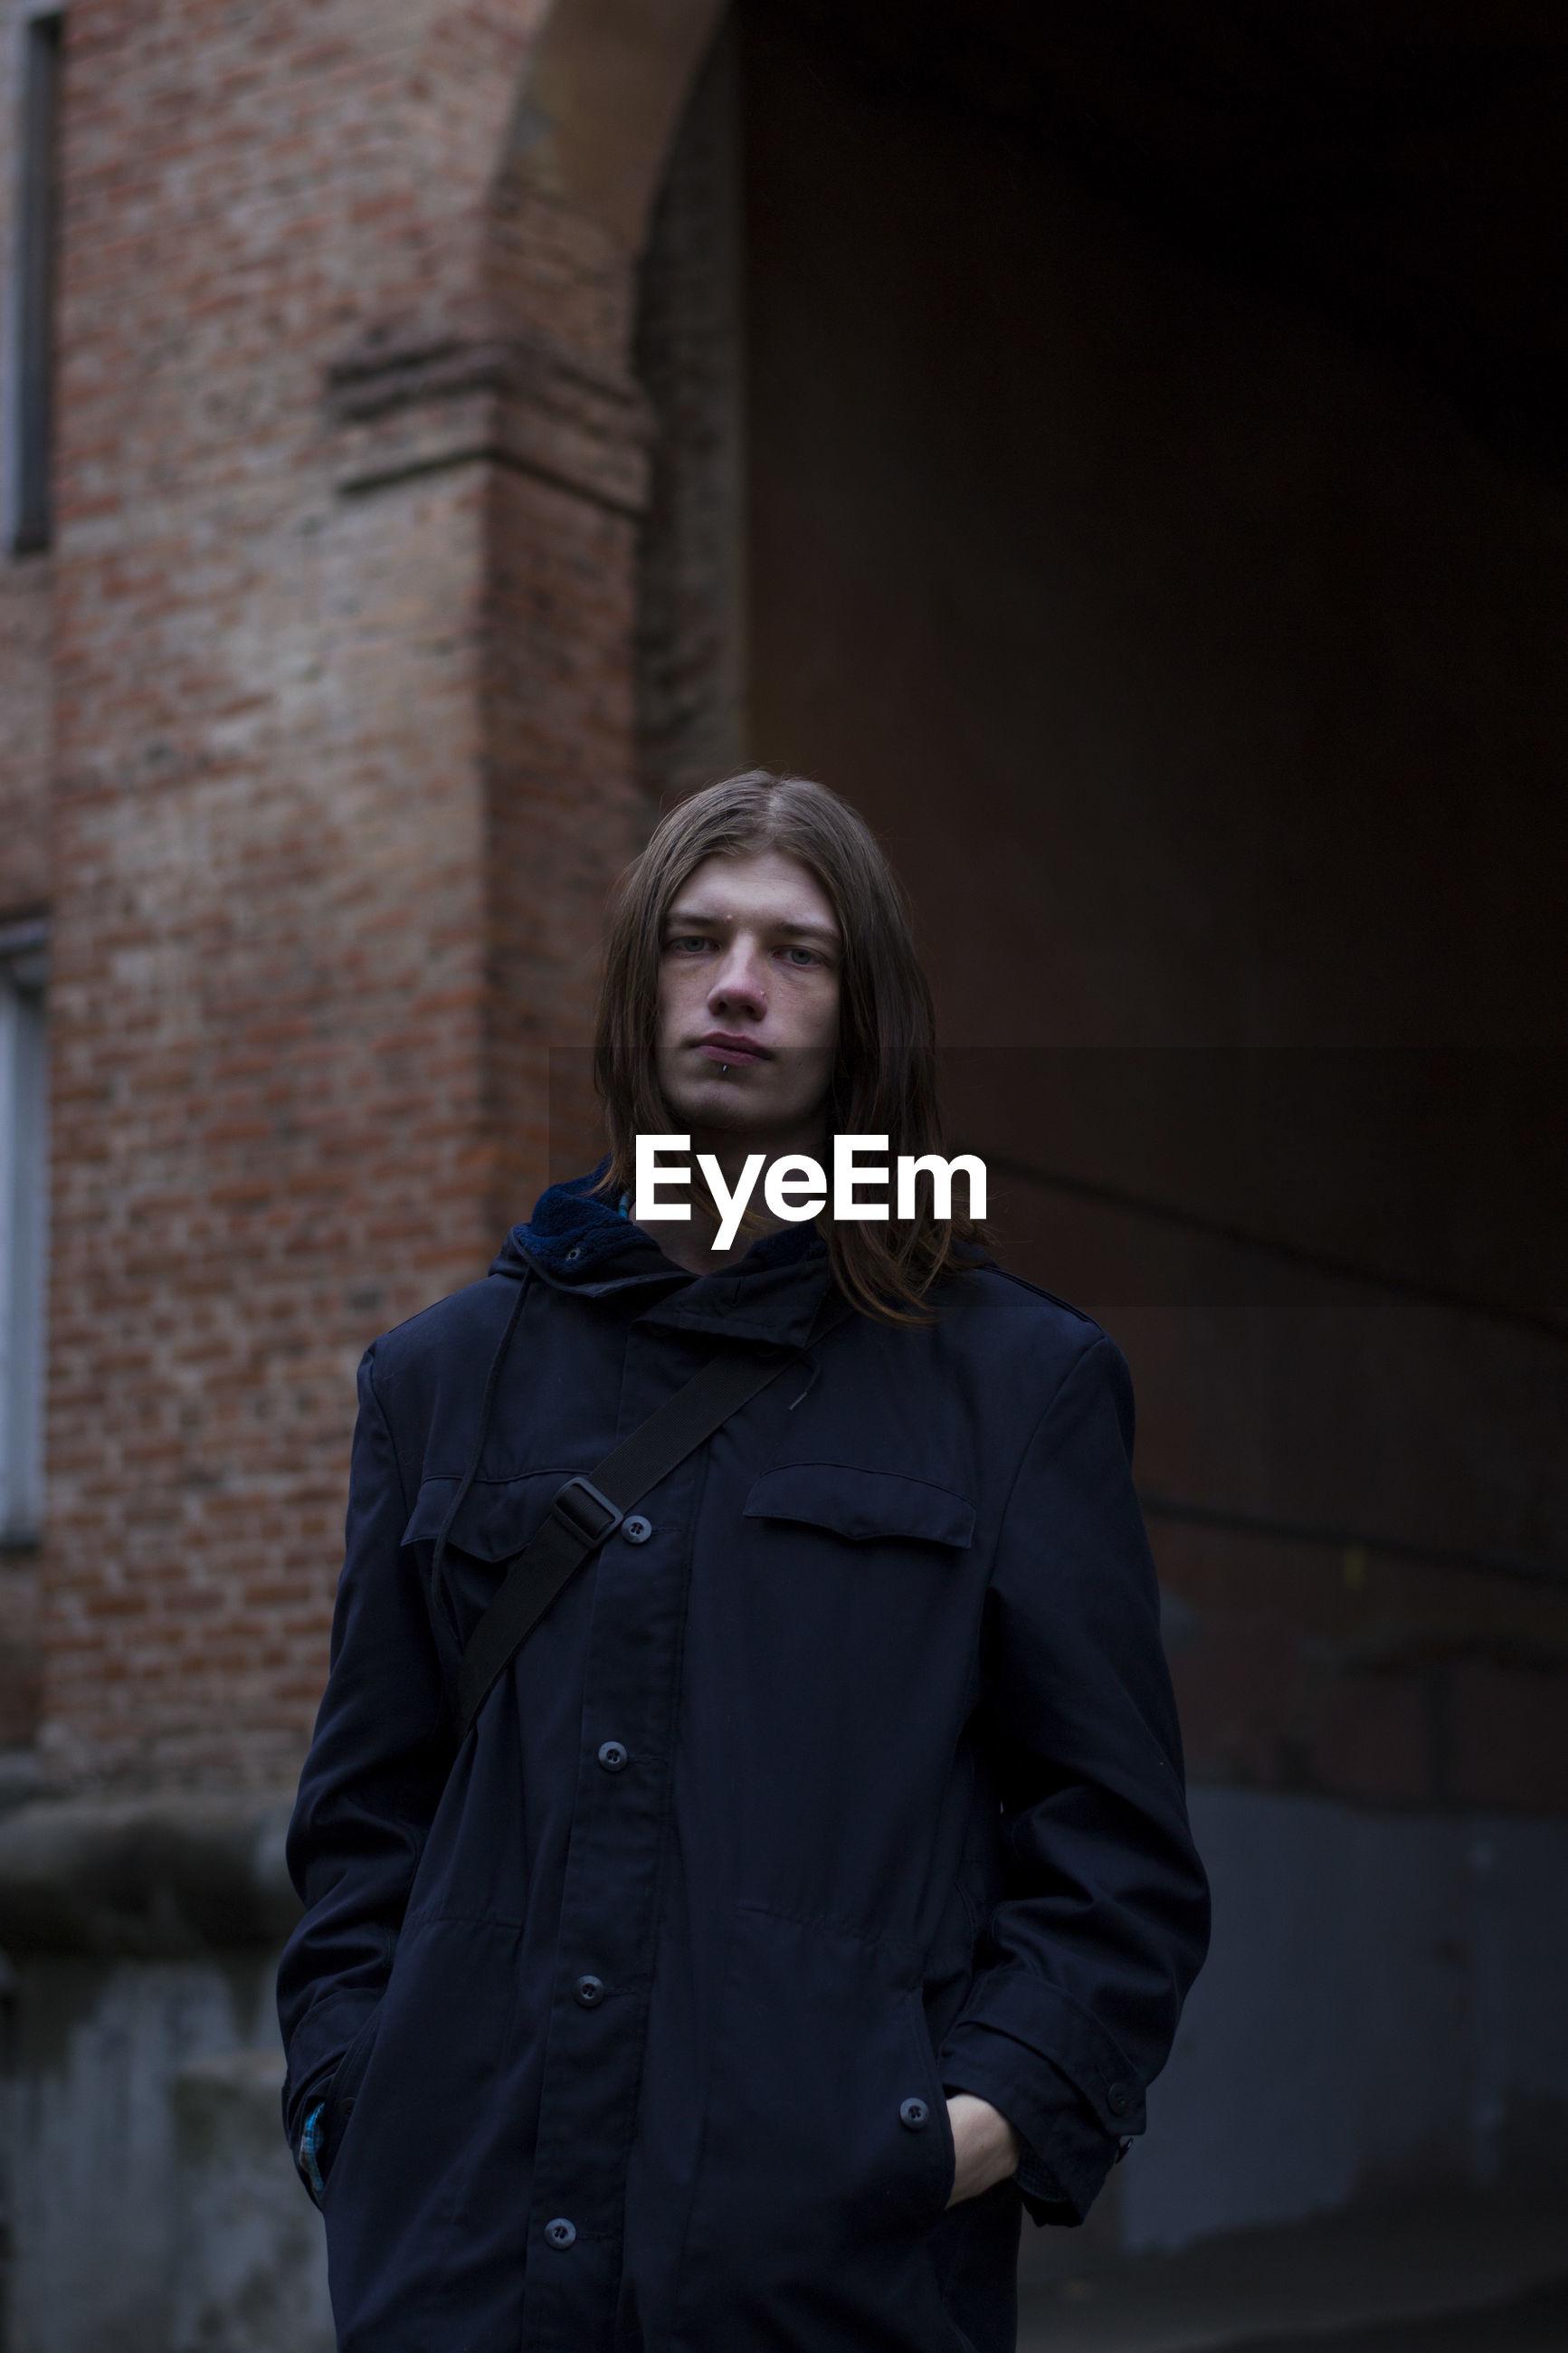 Portrait of man standing in front of brick building